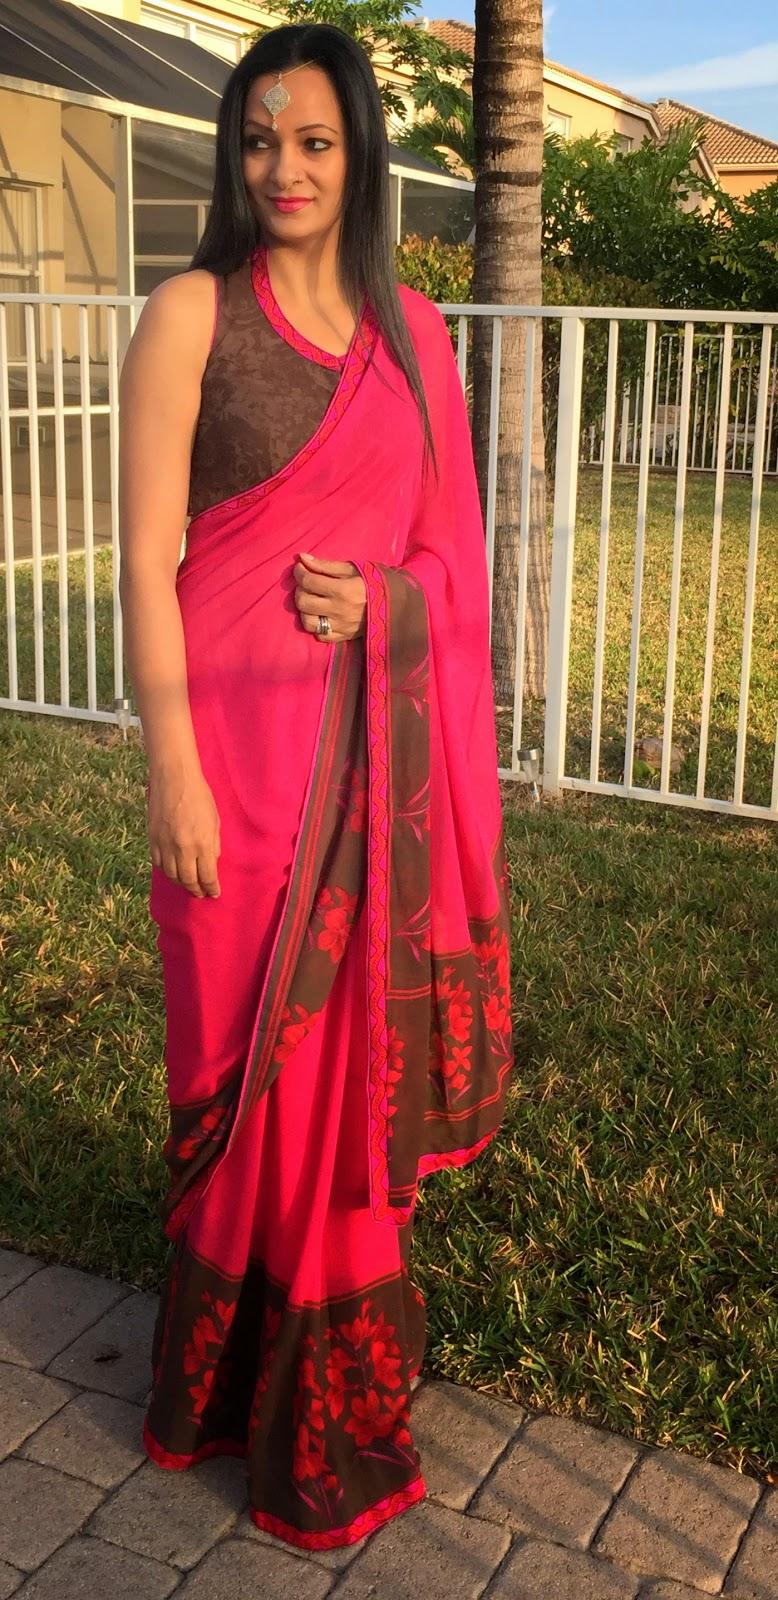 outfit of the day sareezethnic RetroLook sareez www.sandysandhu.co